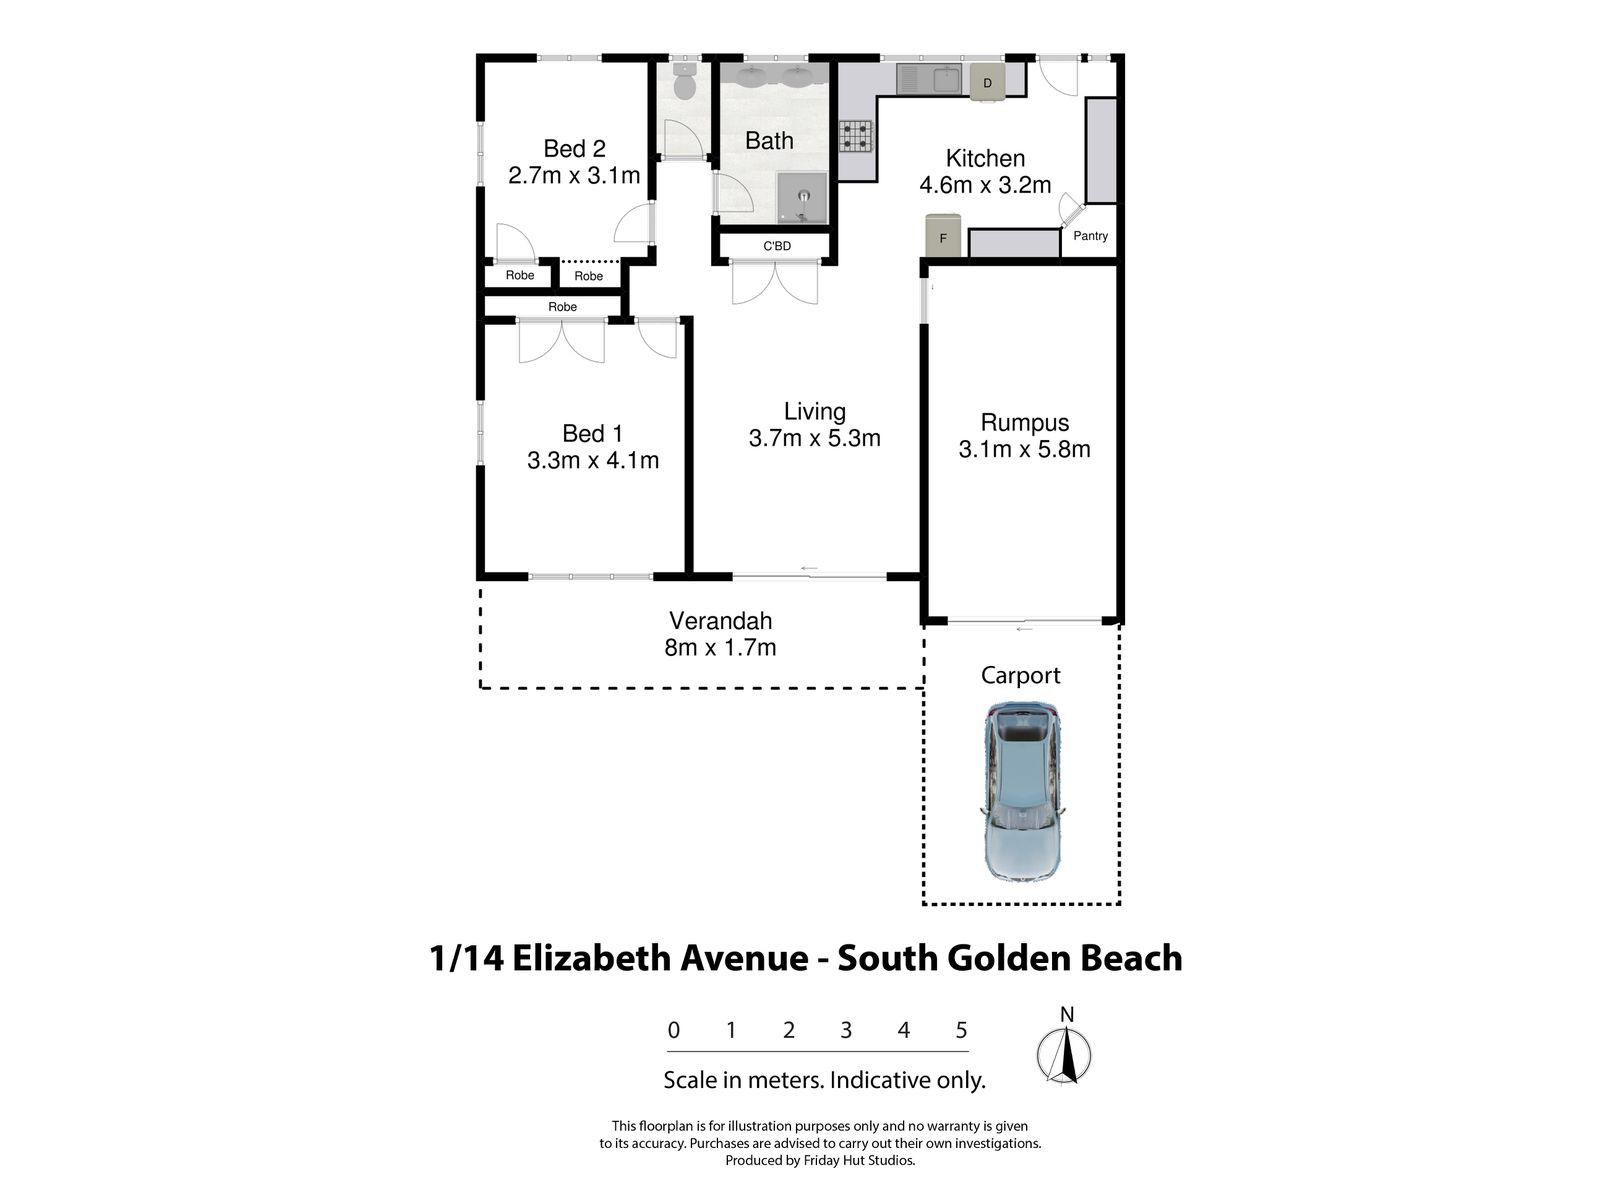 1 / 14 Elizabeth Avenue, South Golden Beach